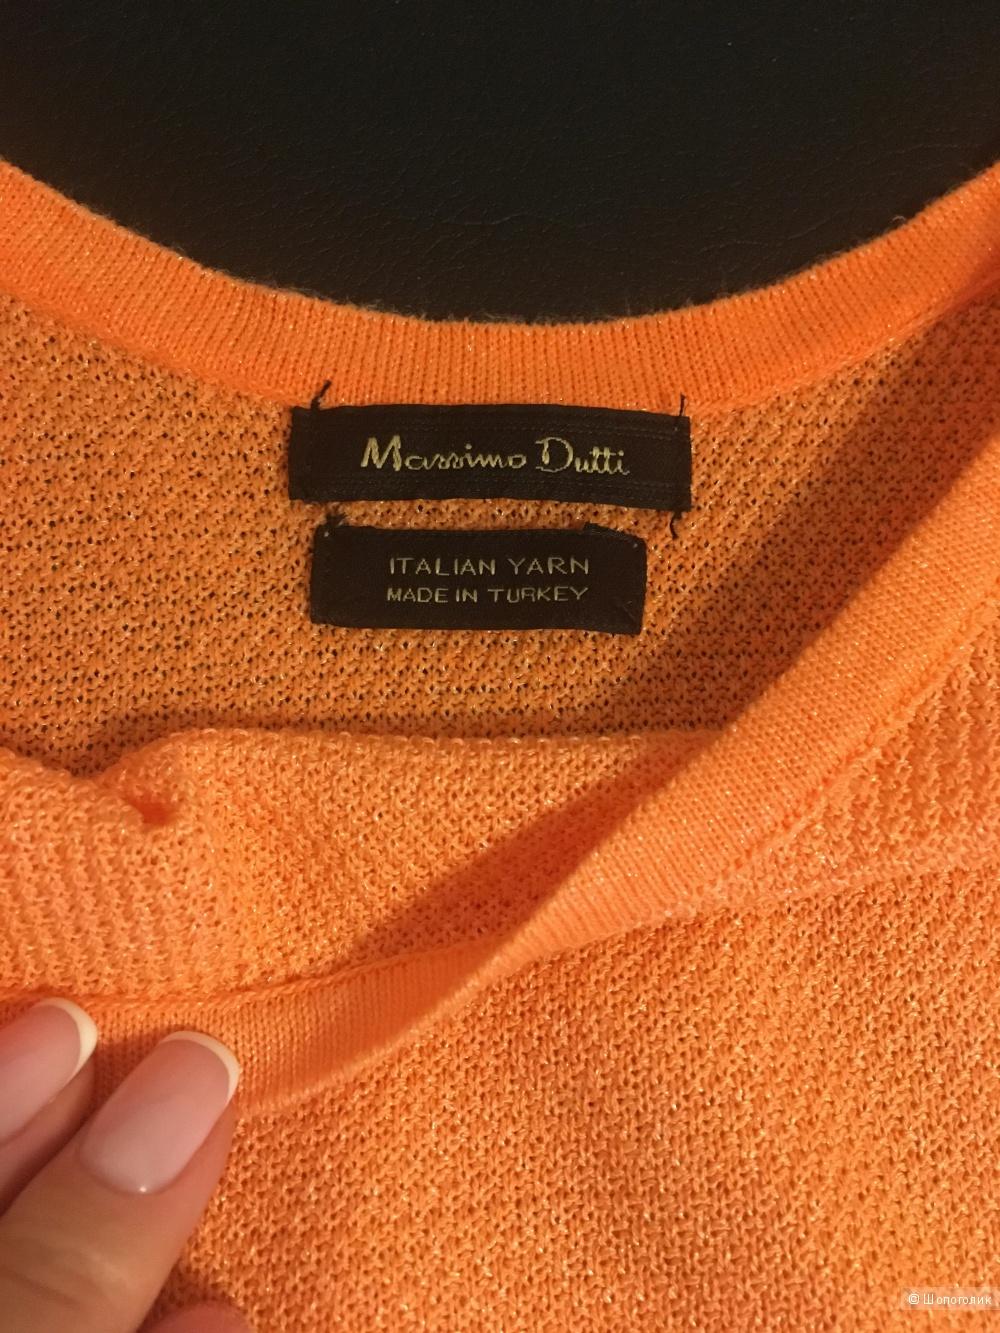 Джемпер, бренд Massimo dutti,  размер 36 (S) на российский 40-42-44